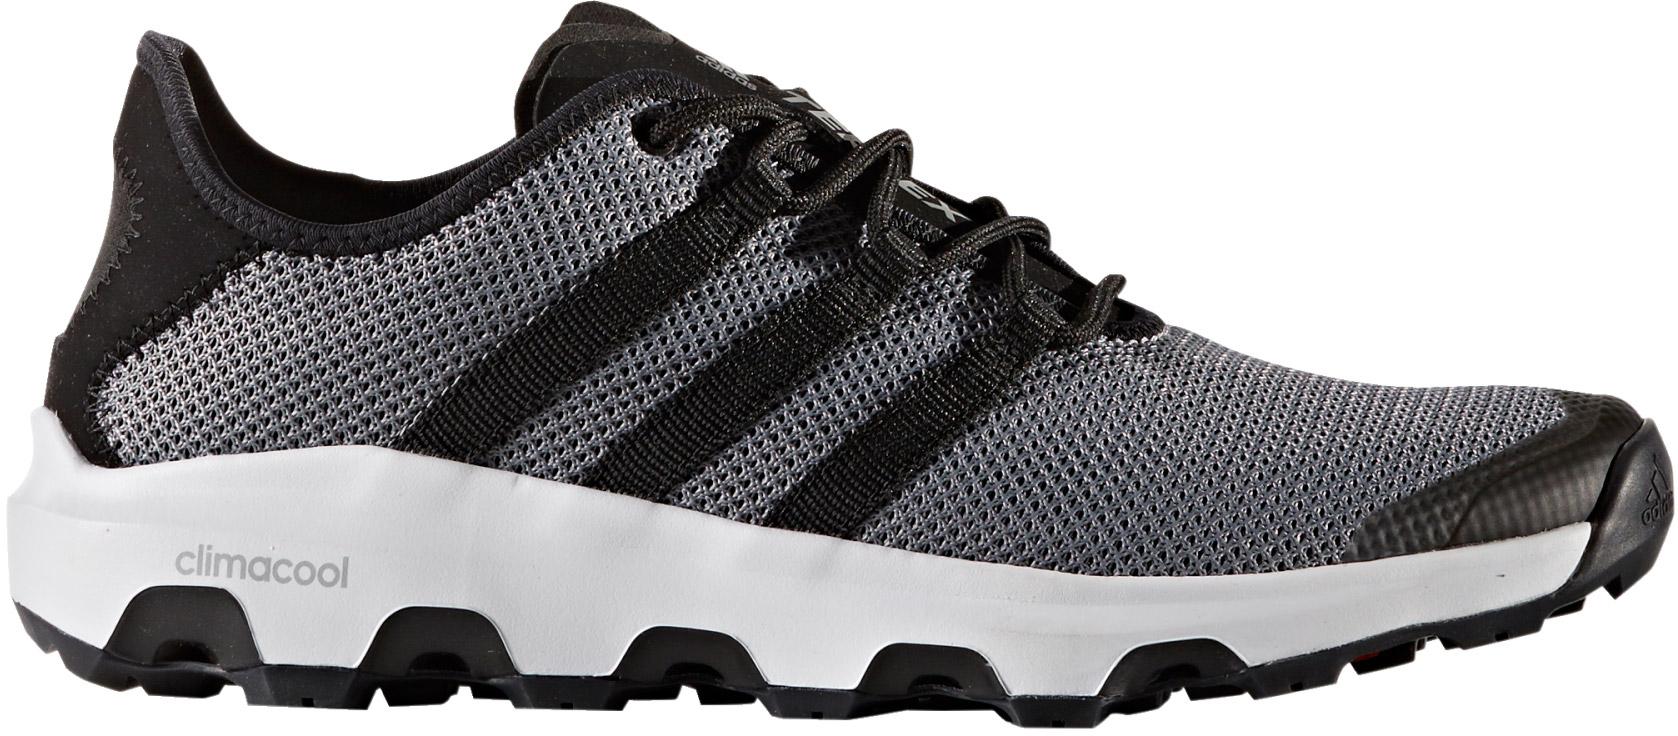 adidas TERREX CC VOYAGER. Pánská treková obuv be4365d552